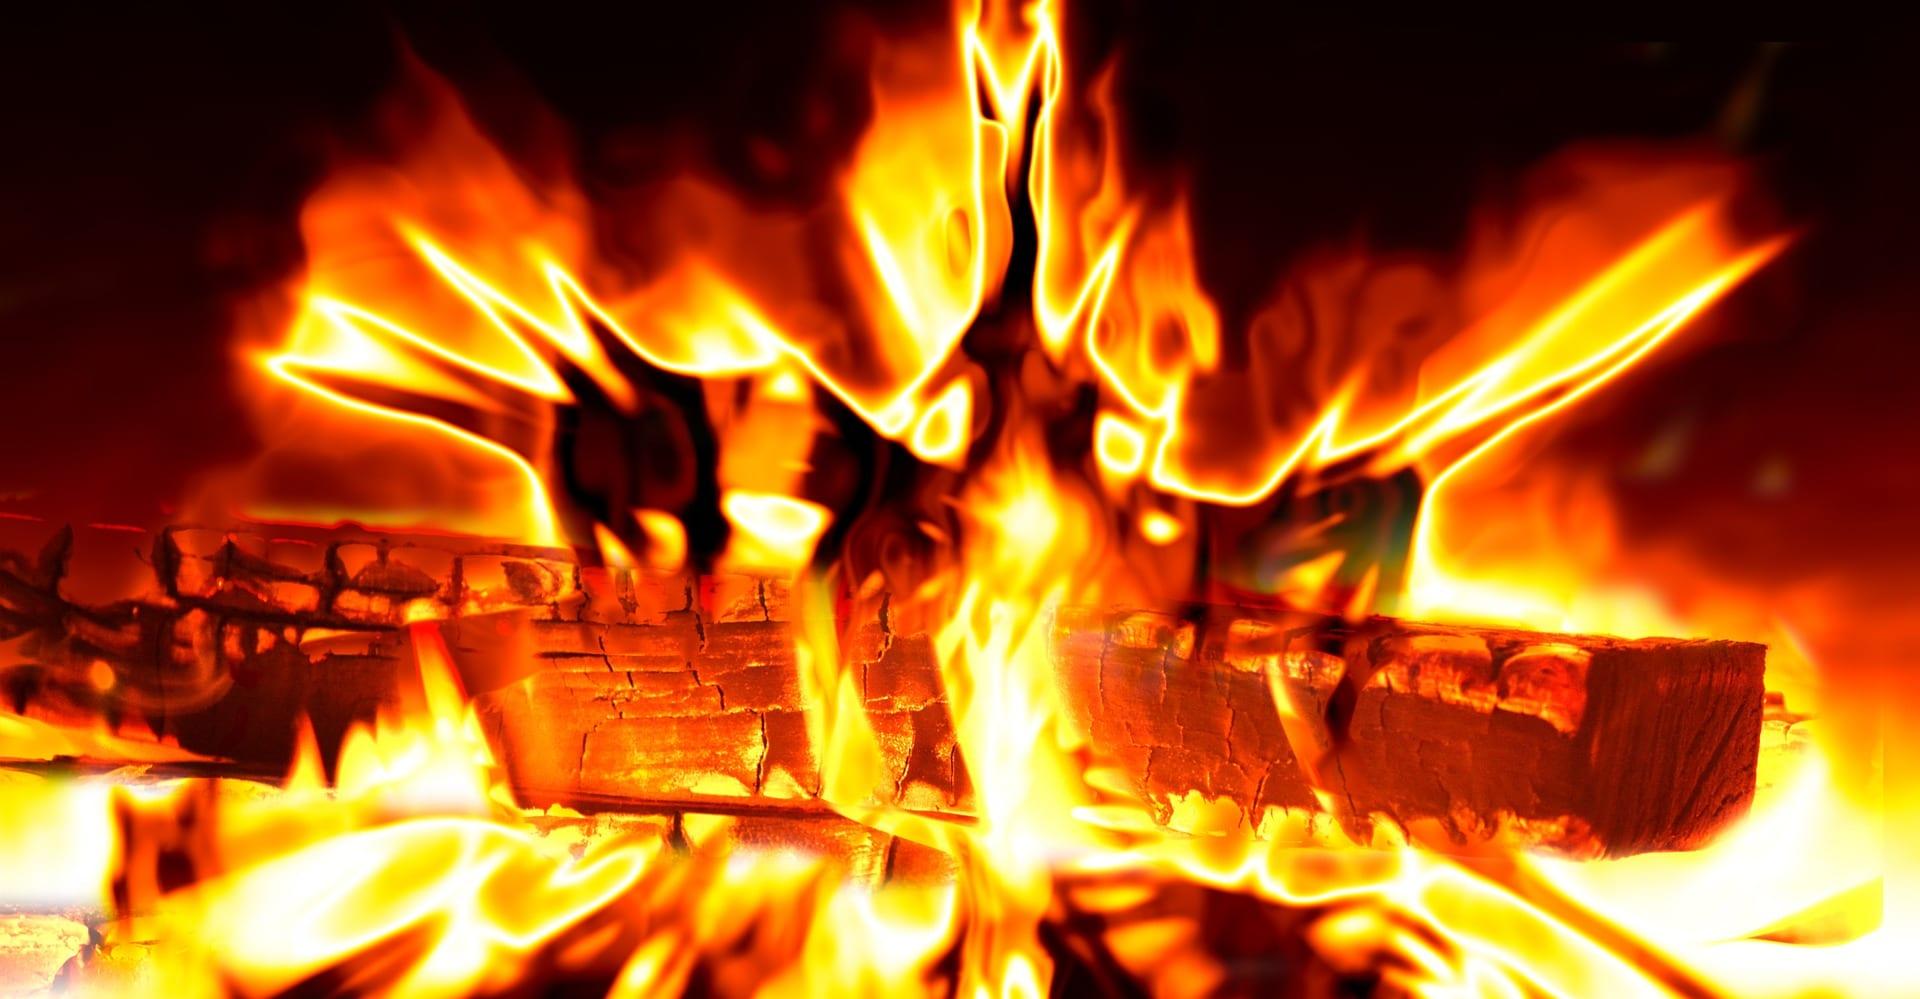 A log fire burning